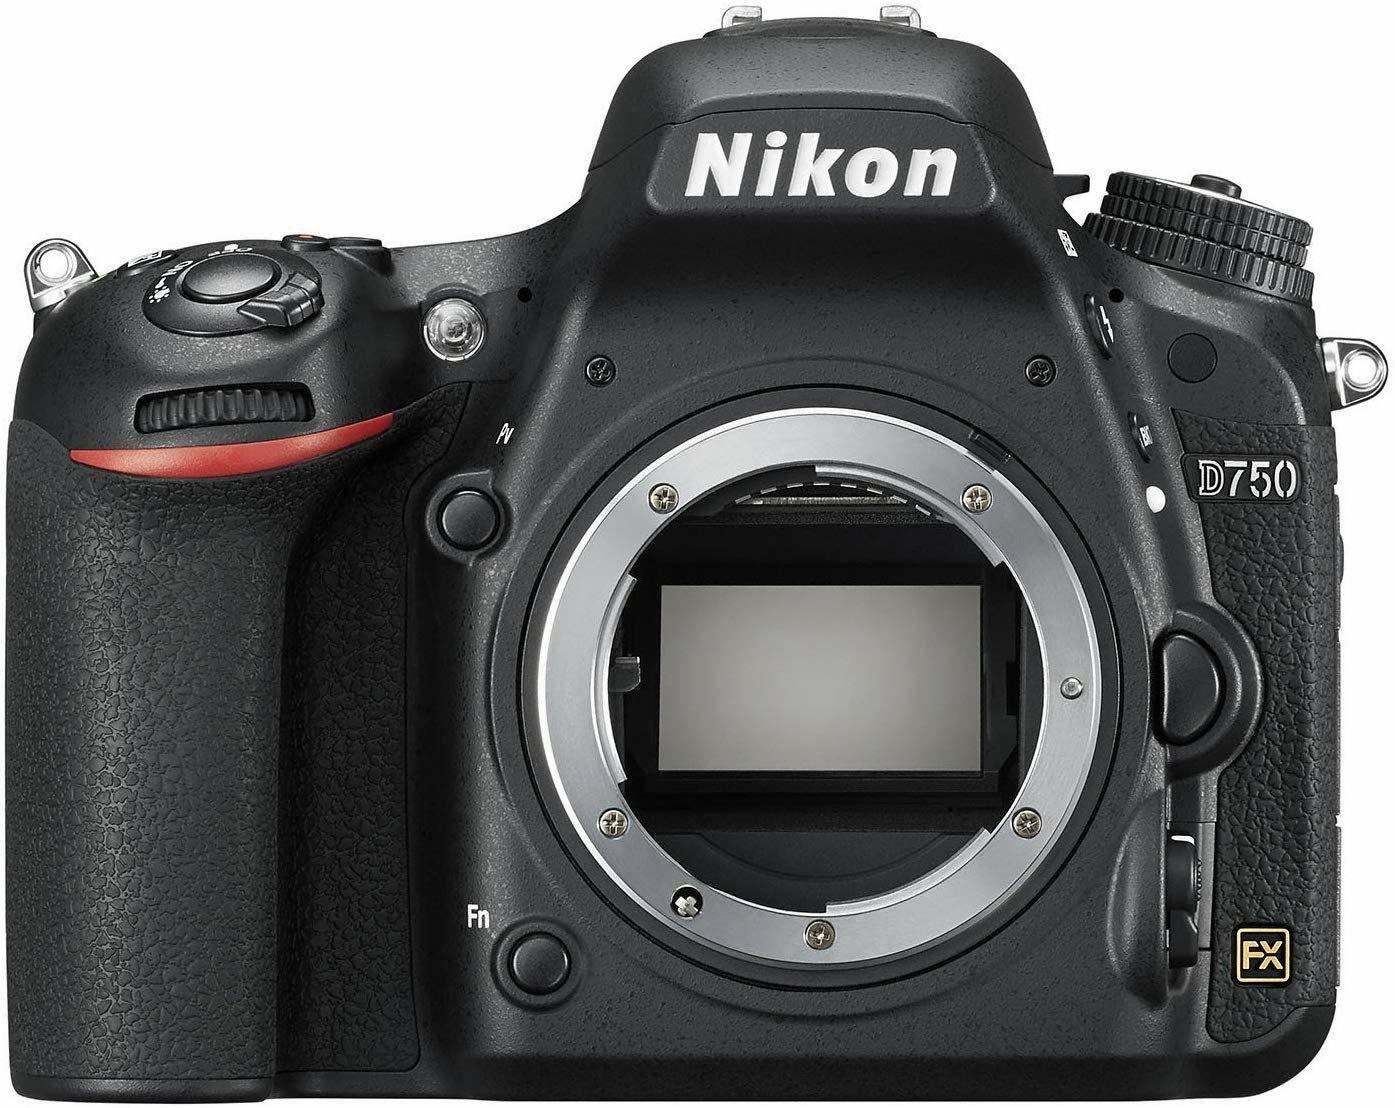 Nikon D750 SLR Spiegelreflexcamera Body, 24,3 megapixel, 8,1 cm (3,2 inch) Display, HDMI, USB 2.0